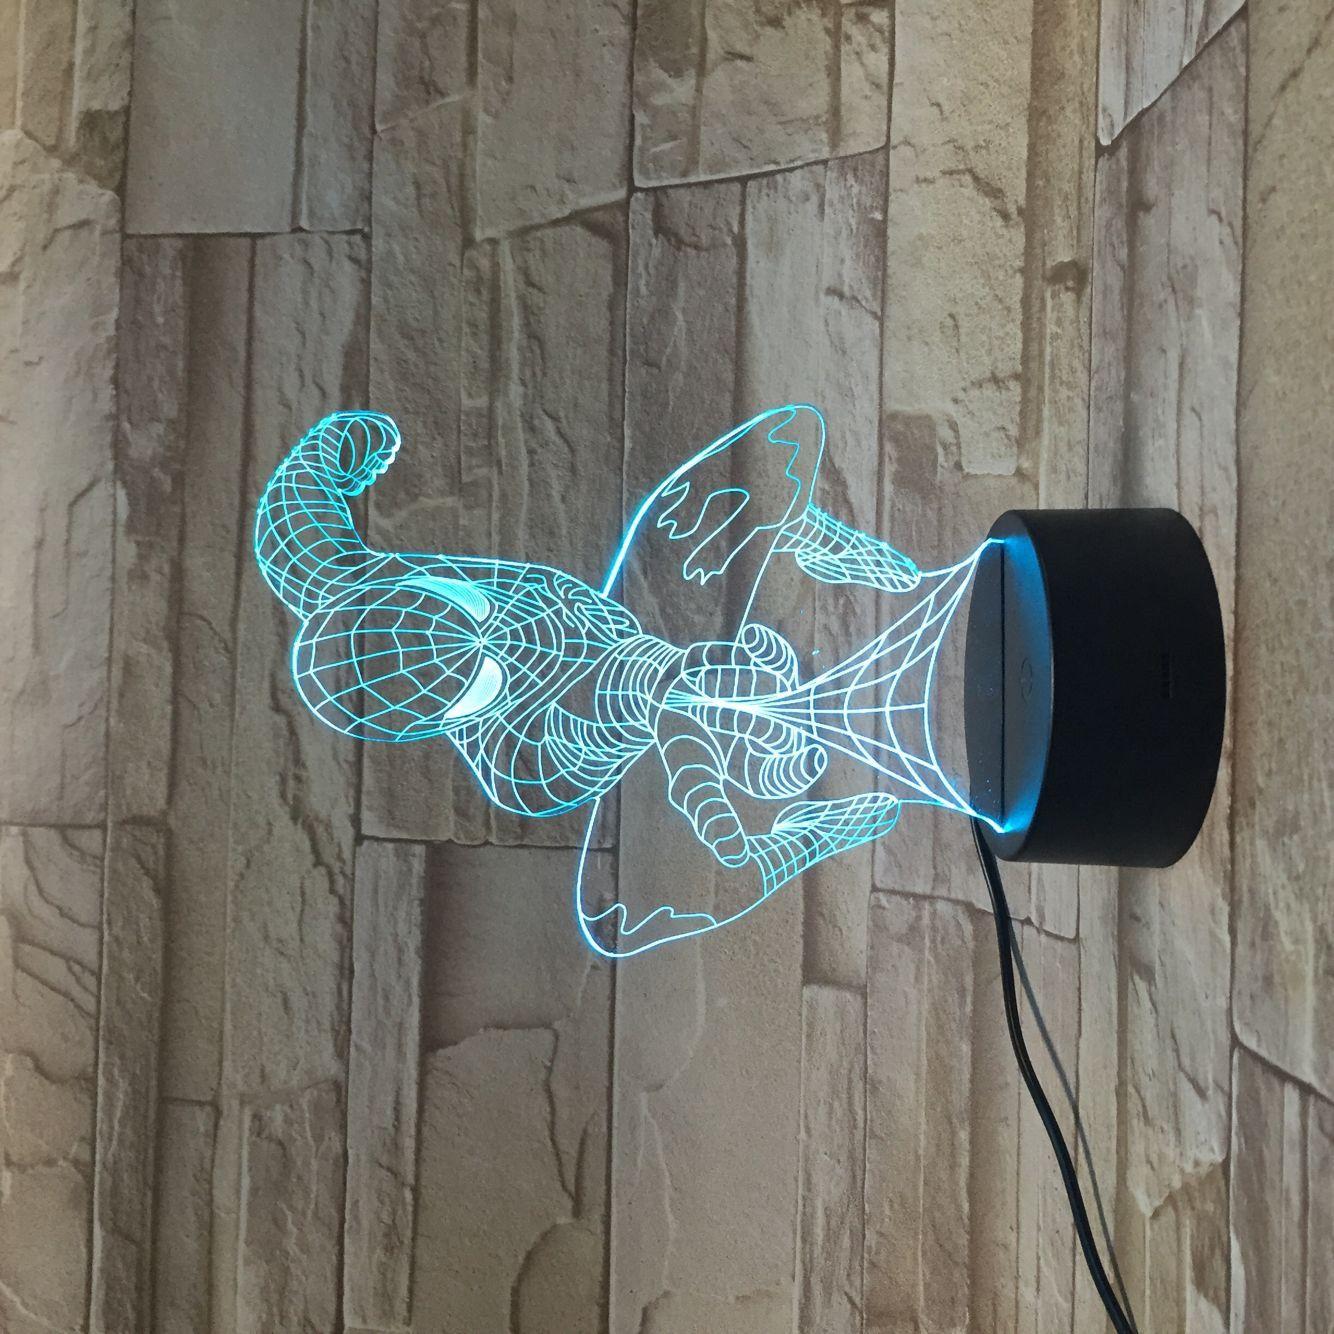 3d Lamp Spiderman 3d Illusion Lamp 3d Illusions Creative Lamps